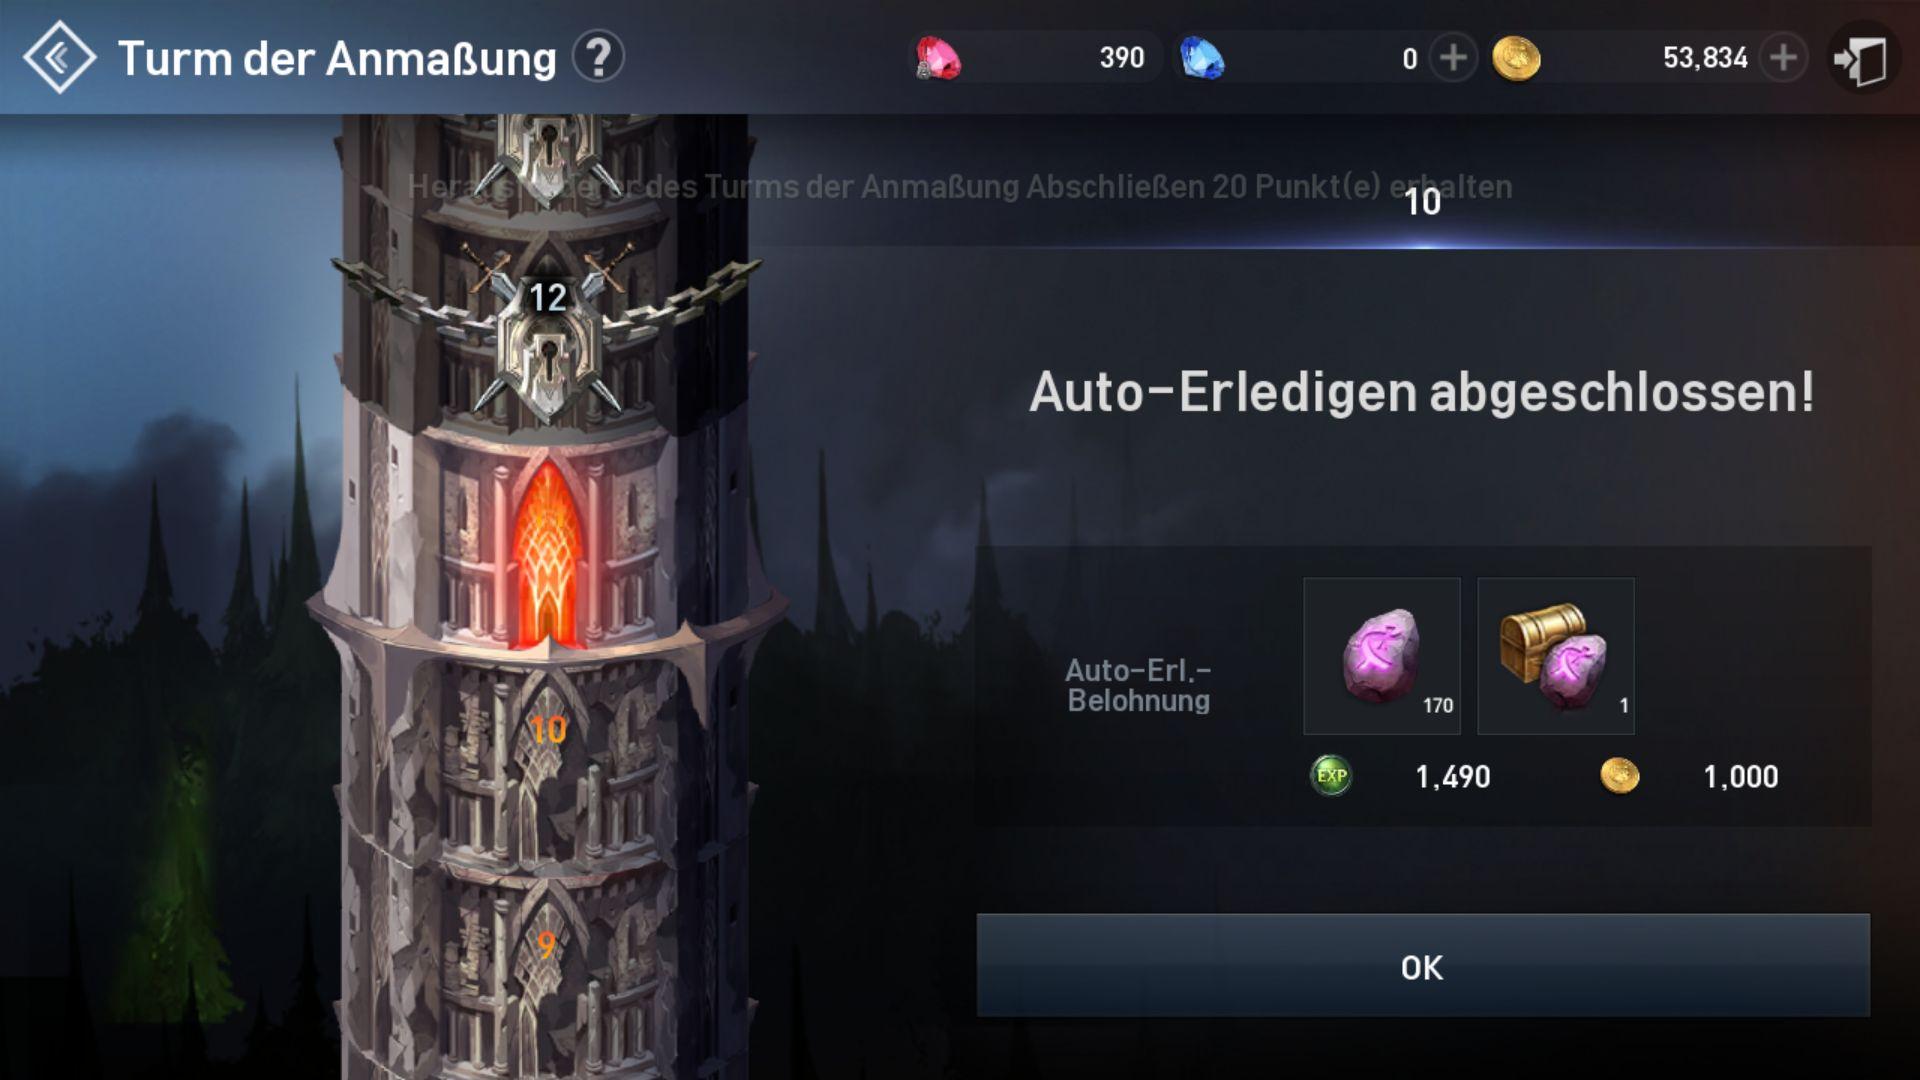 Lineage 2 Revolution Turm der Anmaßung